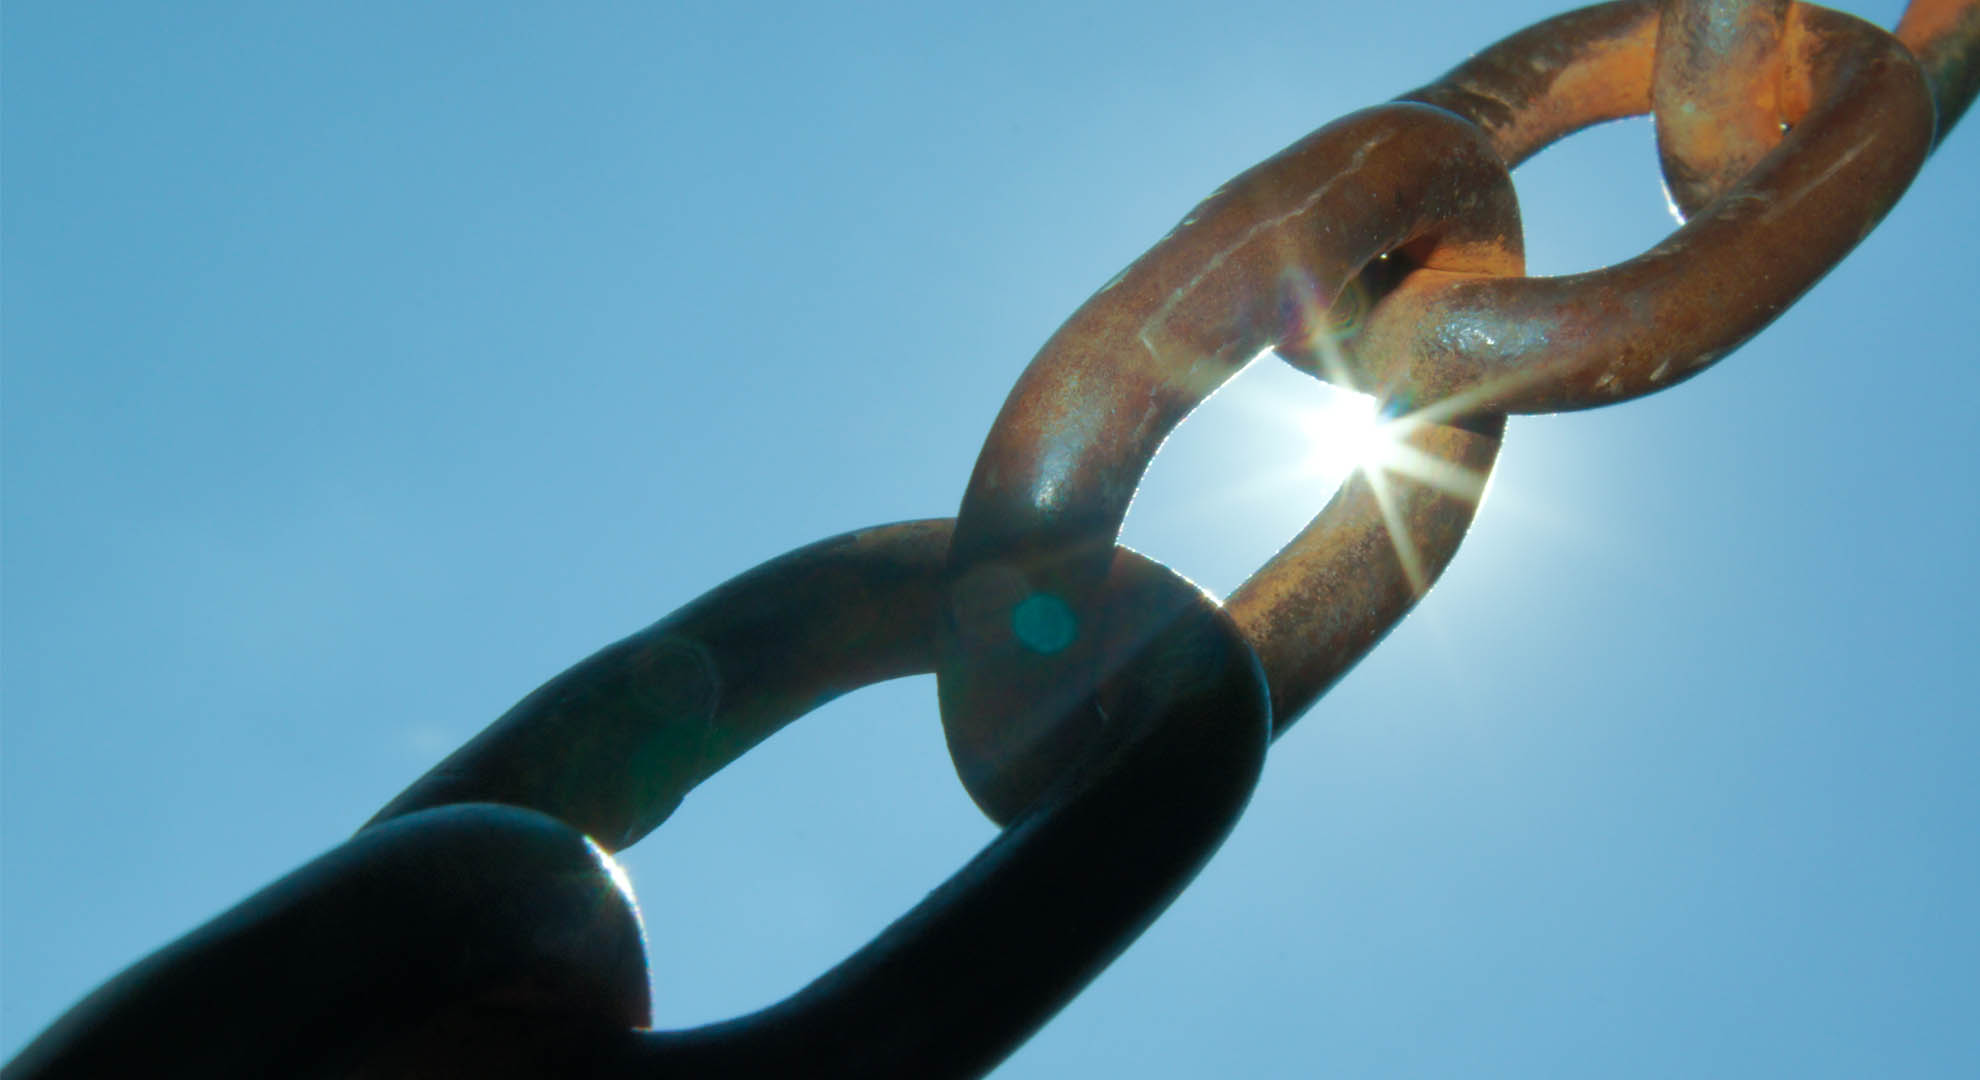 stefan-hokke-proces-verbinding-projectbeheersing-proces-risicomanagement-financieel-planning